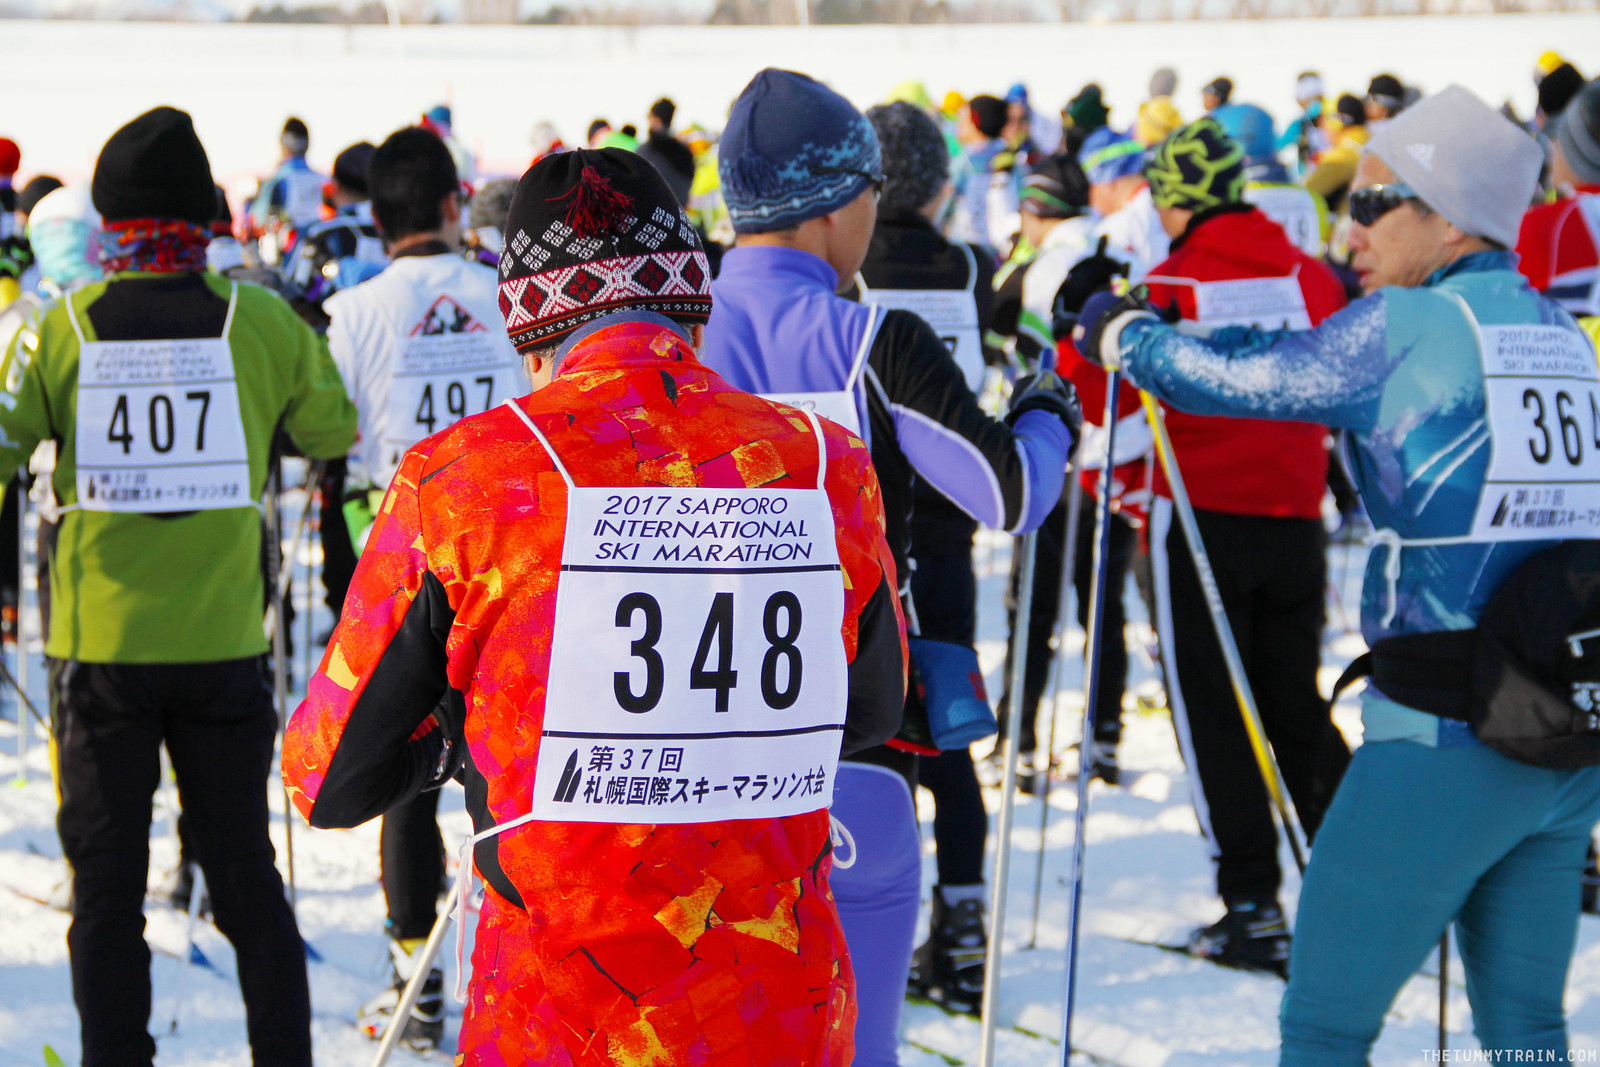 32876491336 b2889a23c9 h - Sapporo Snow And Smile: 8 Unforgettable Winter Experiences in Sapporo City